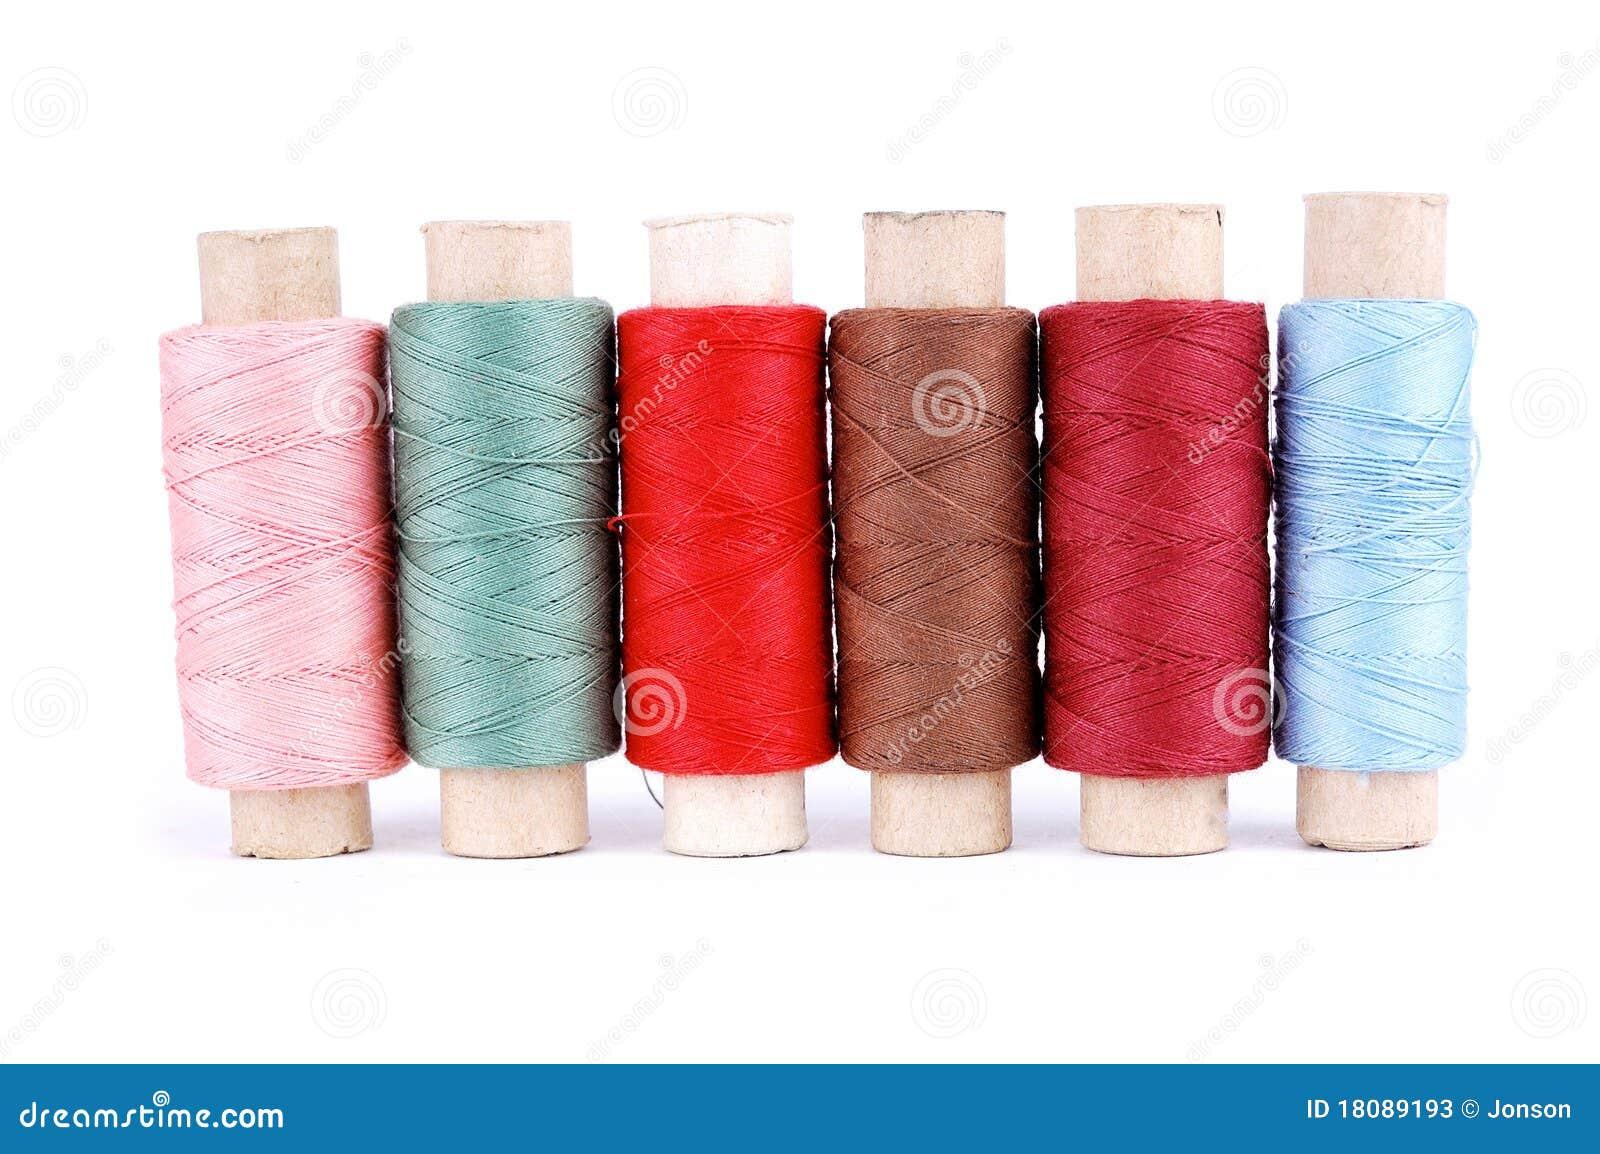 Hanks of threads